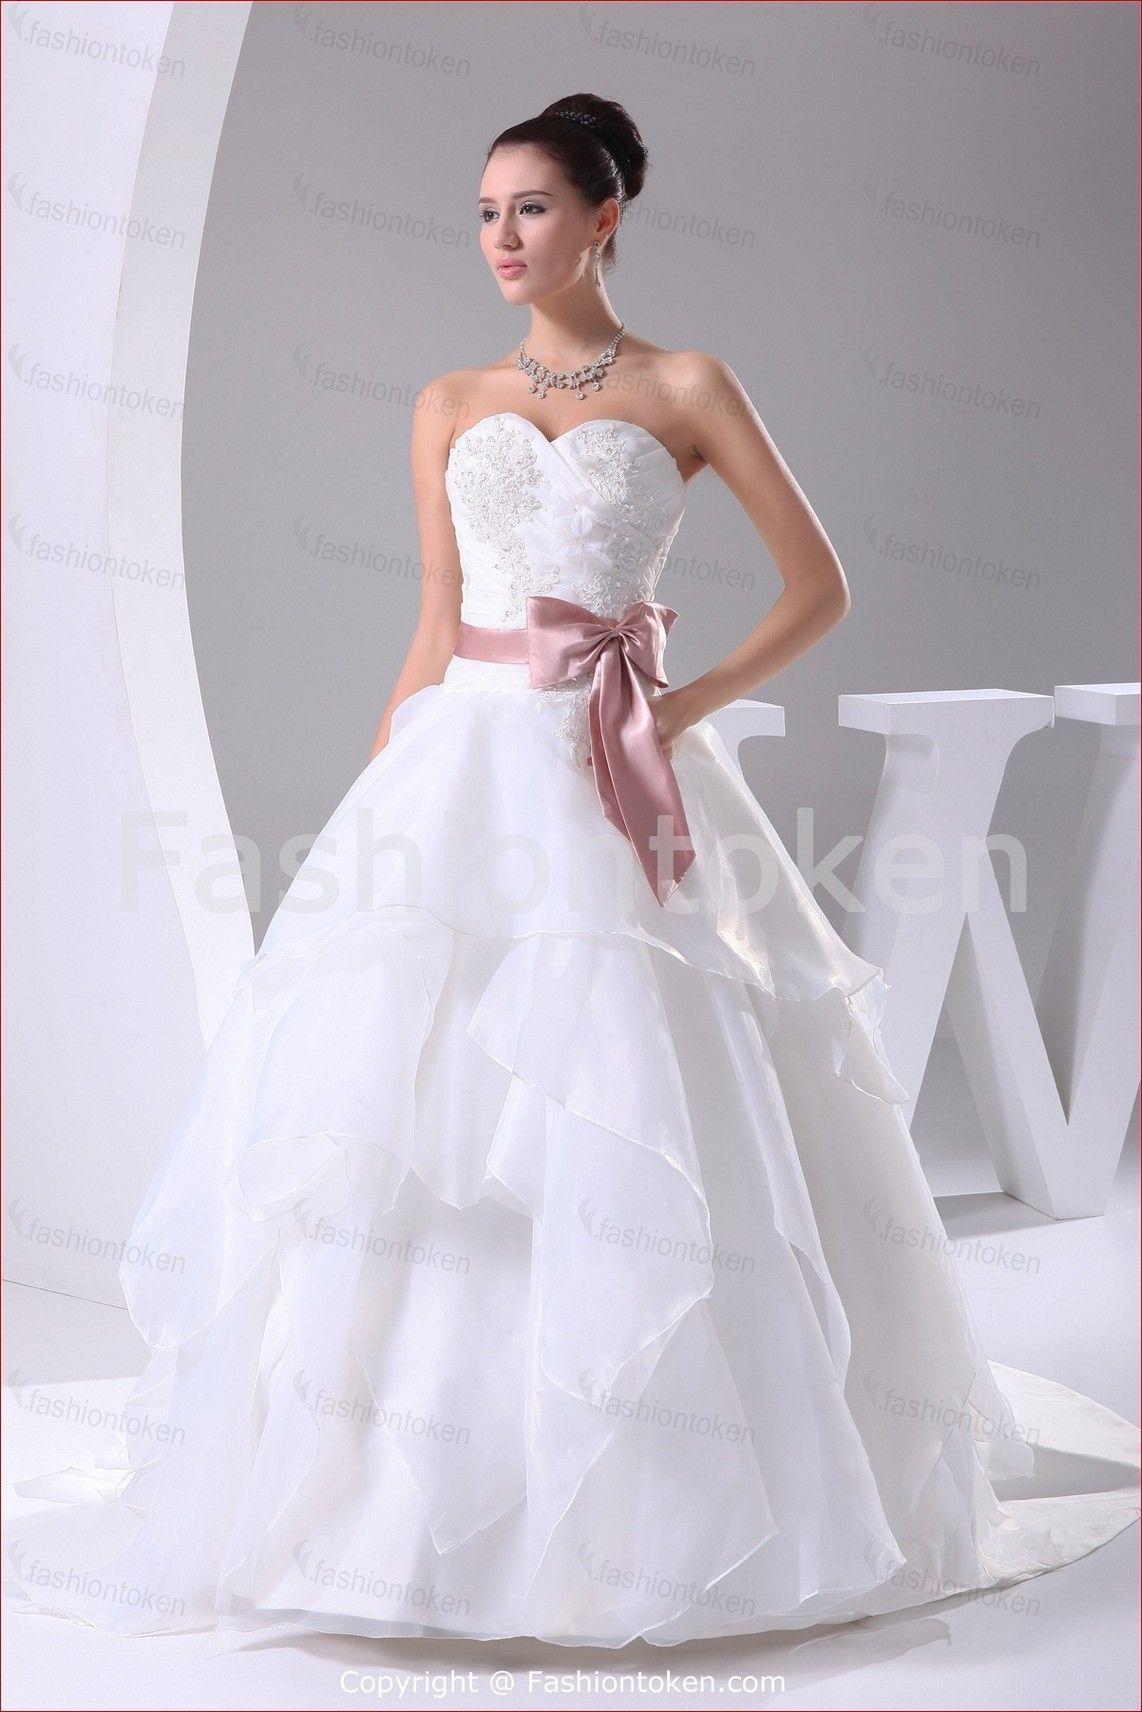 2018 Corset For Under Wedding Dress Informal Wedding Dresses For - Corset For Under Wedding Dress